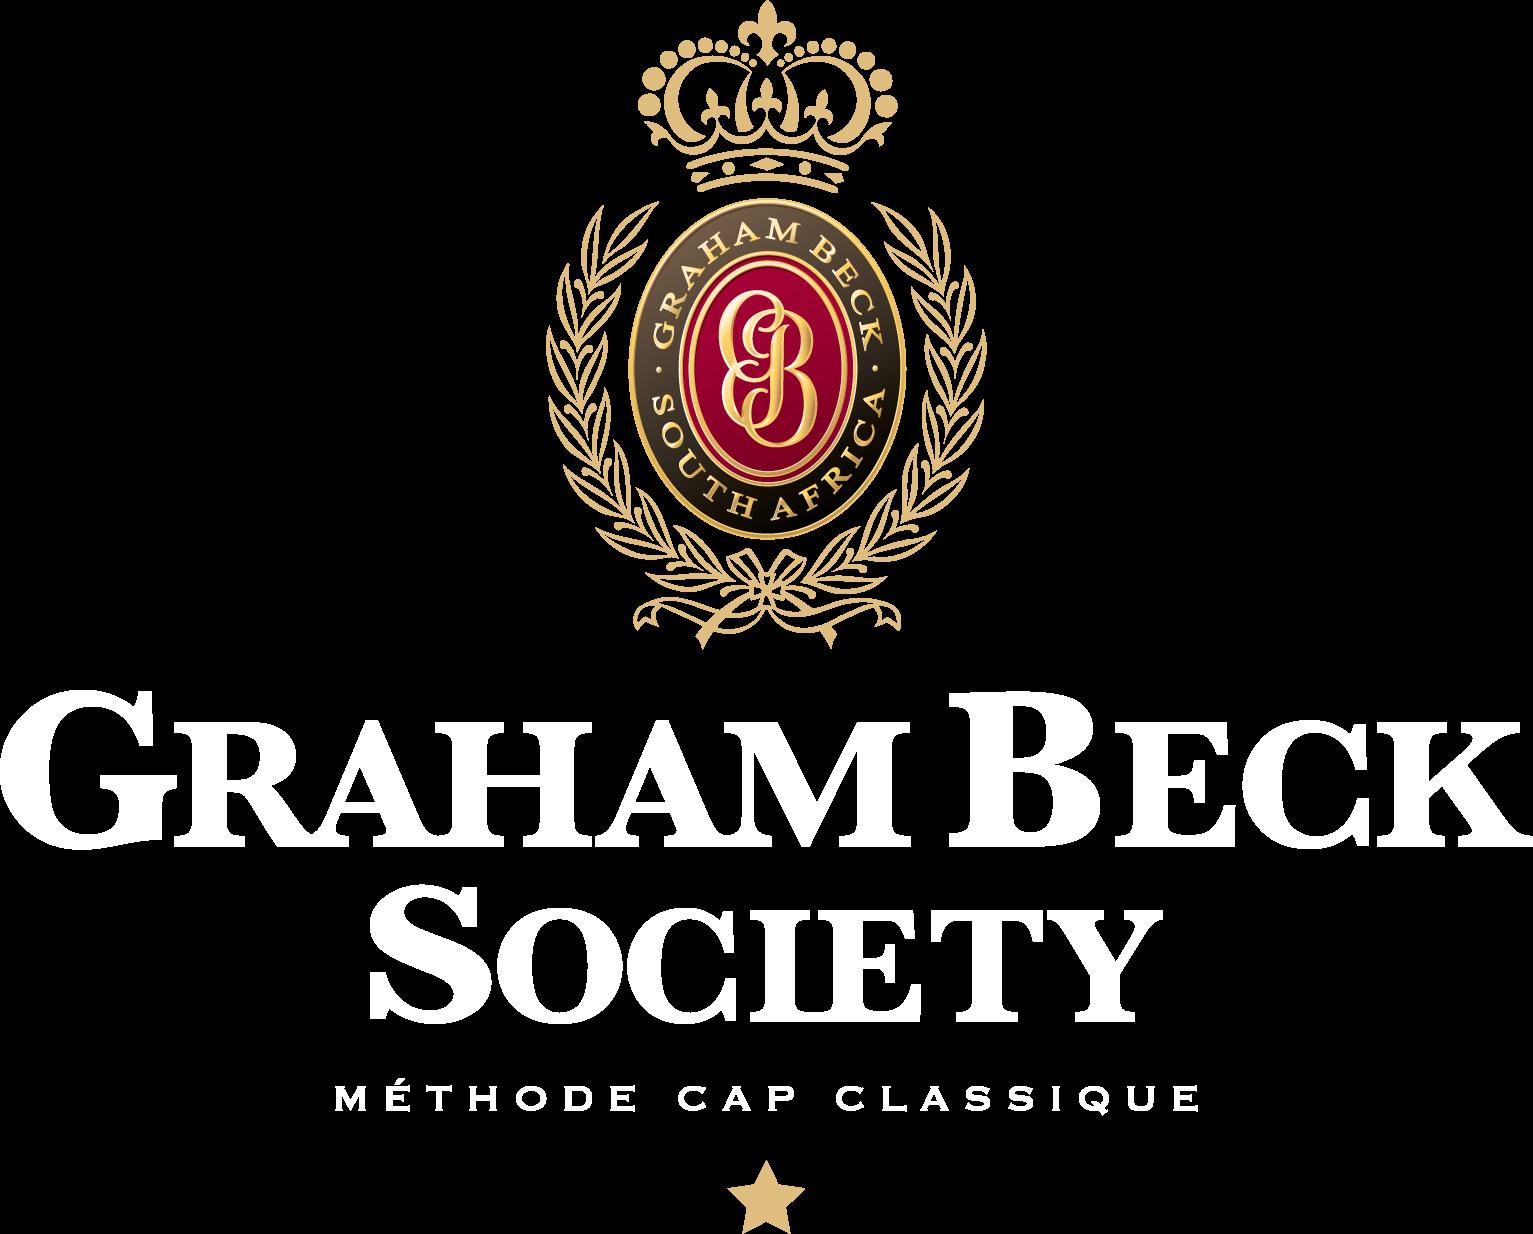 Graham Beck Society logo